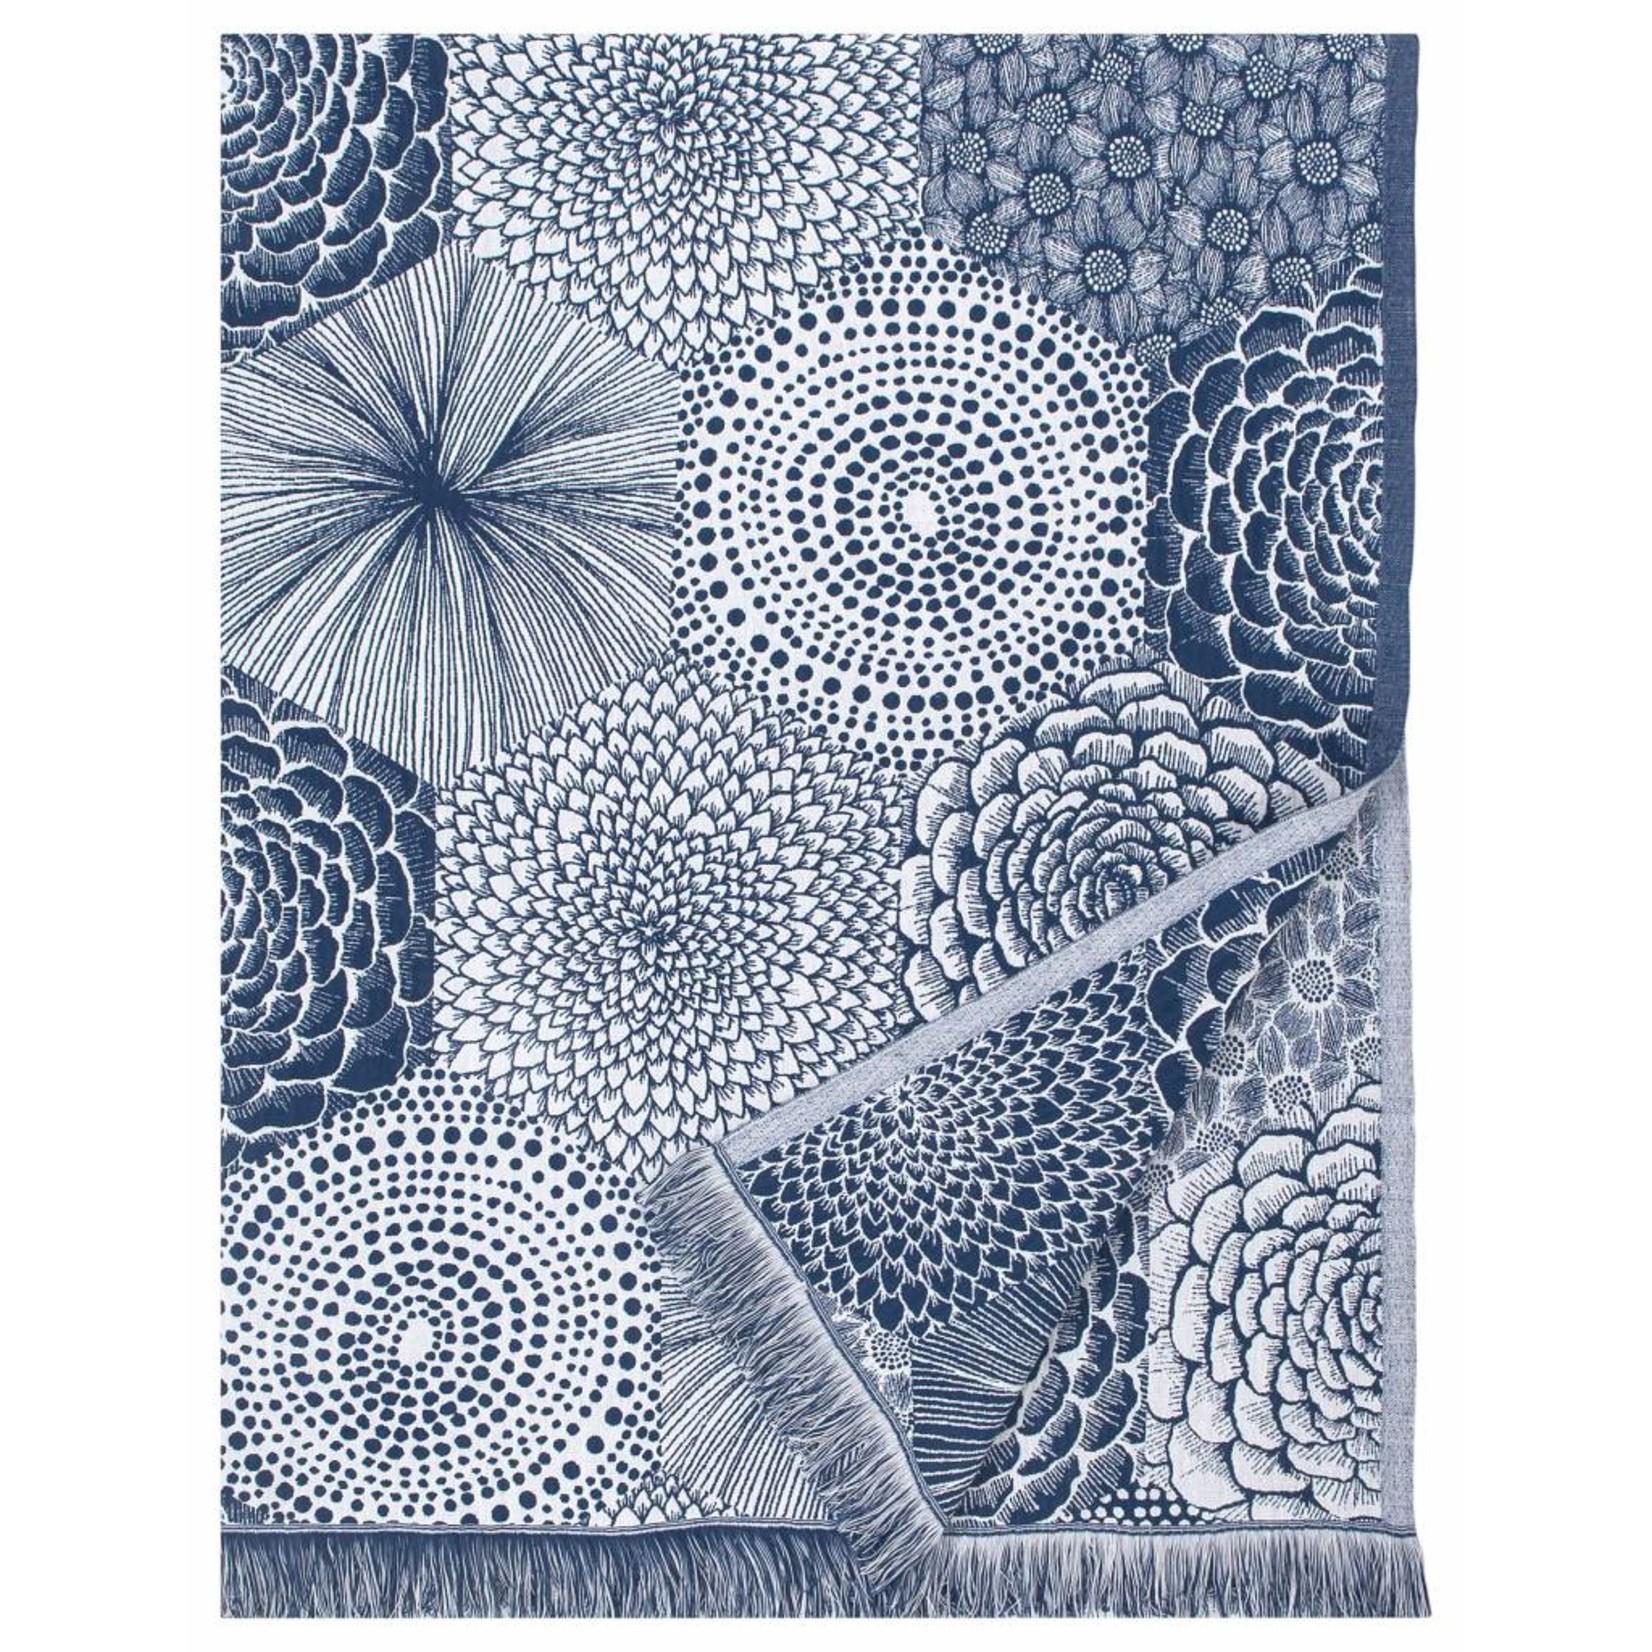 Lapuan Kankurit RUUT tablecloth & blanket linen & organic cotton - blue & white